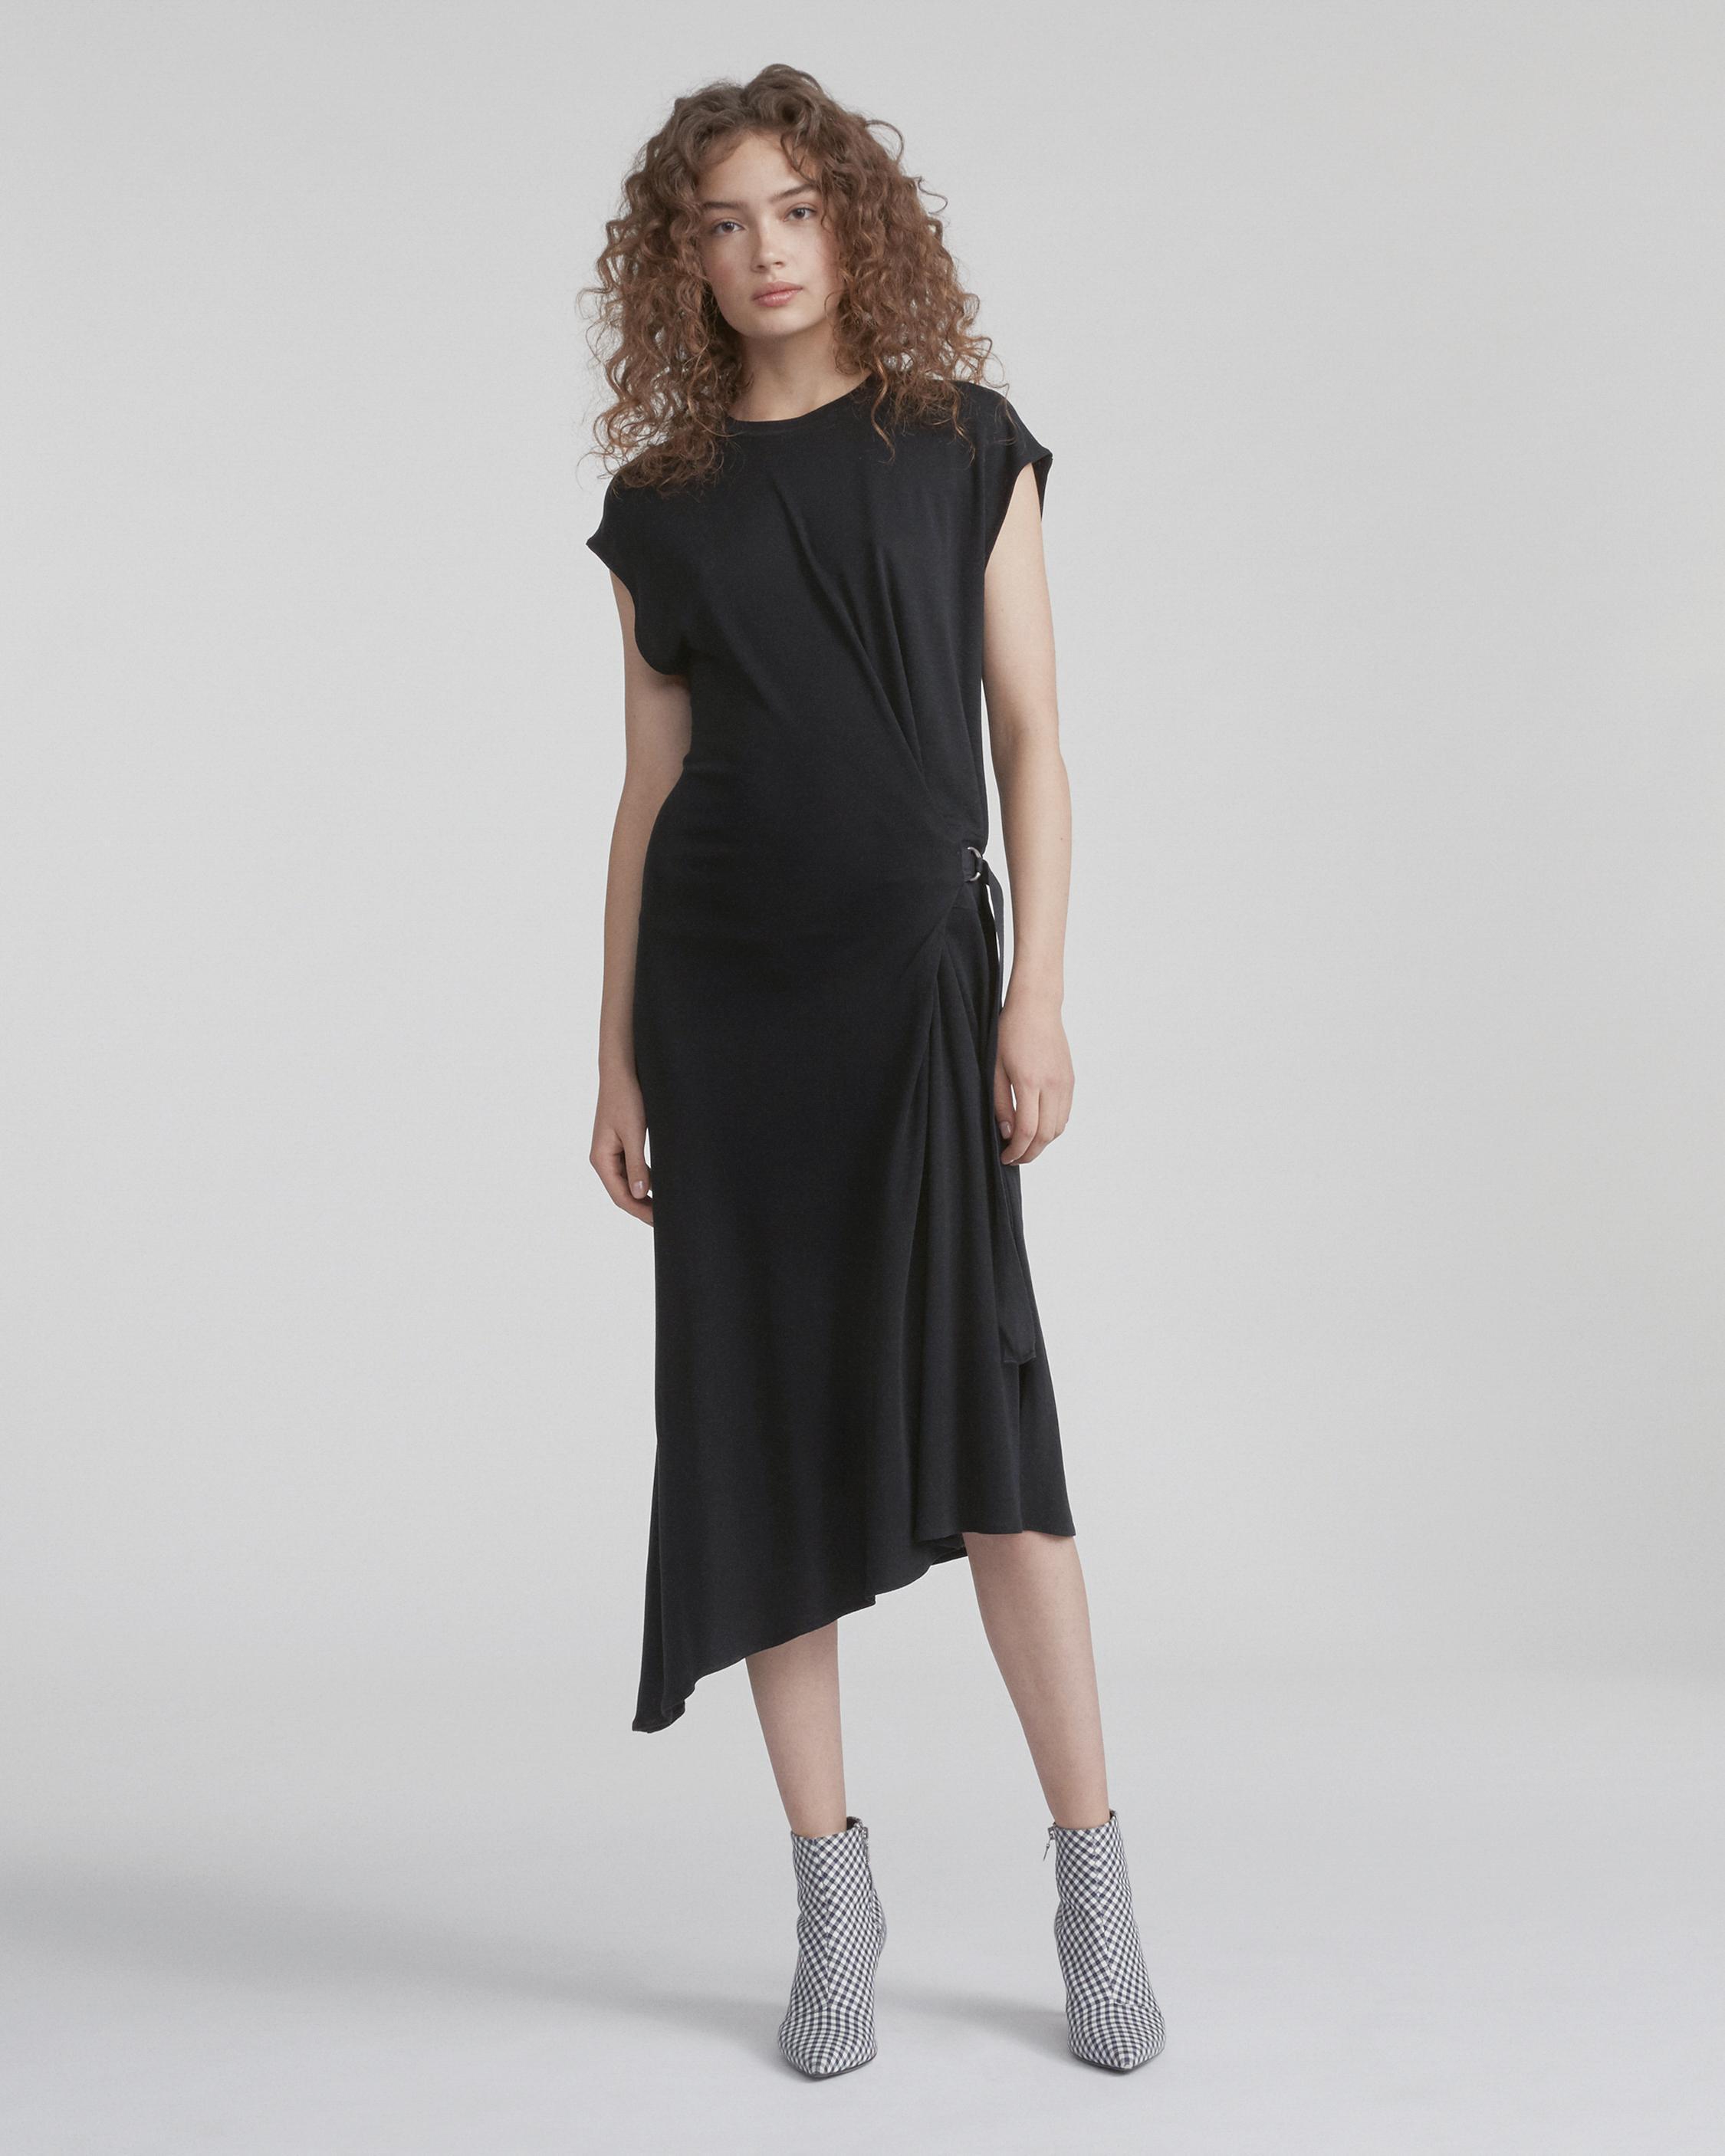 Black Ophelia Dress Rag & Bone TJxDOx8S